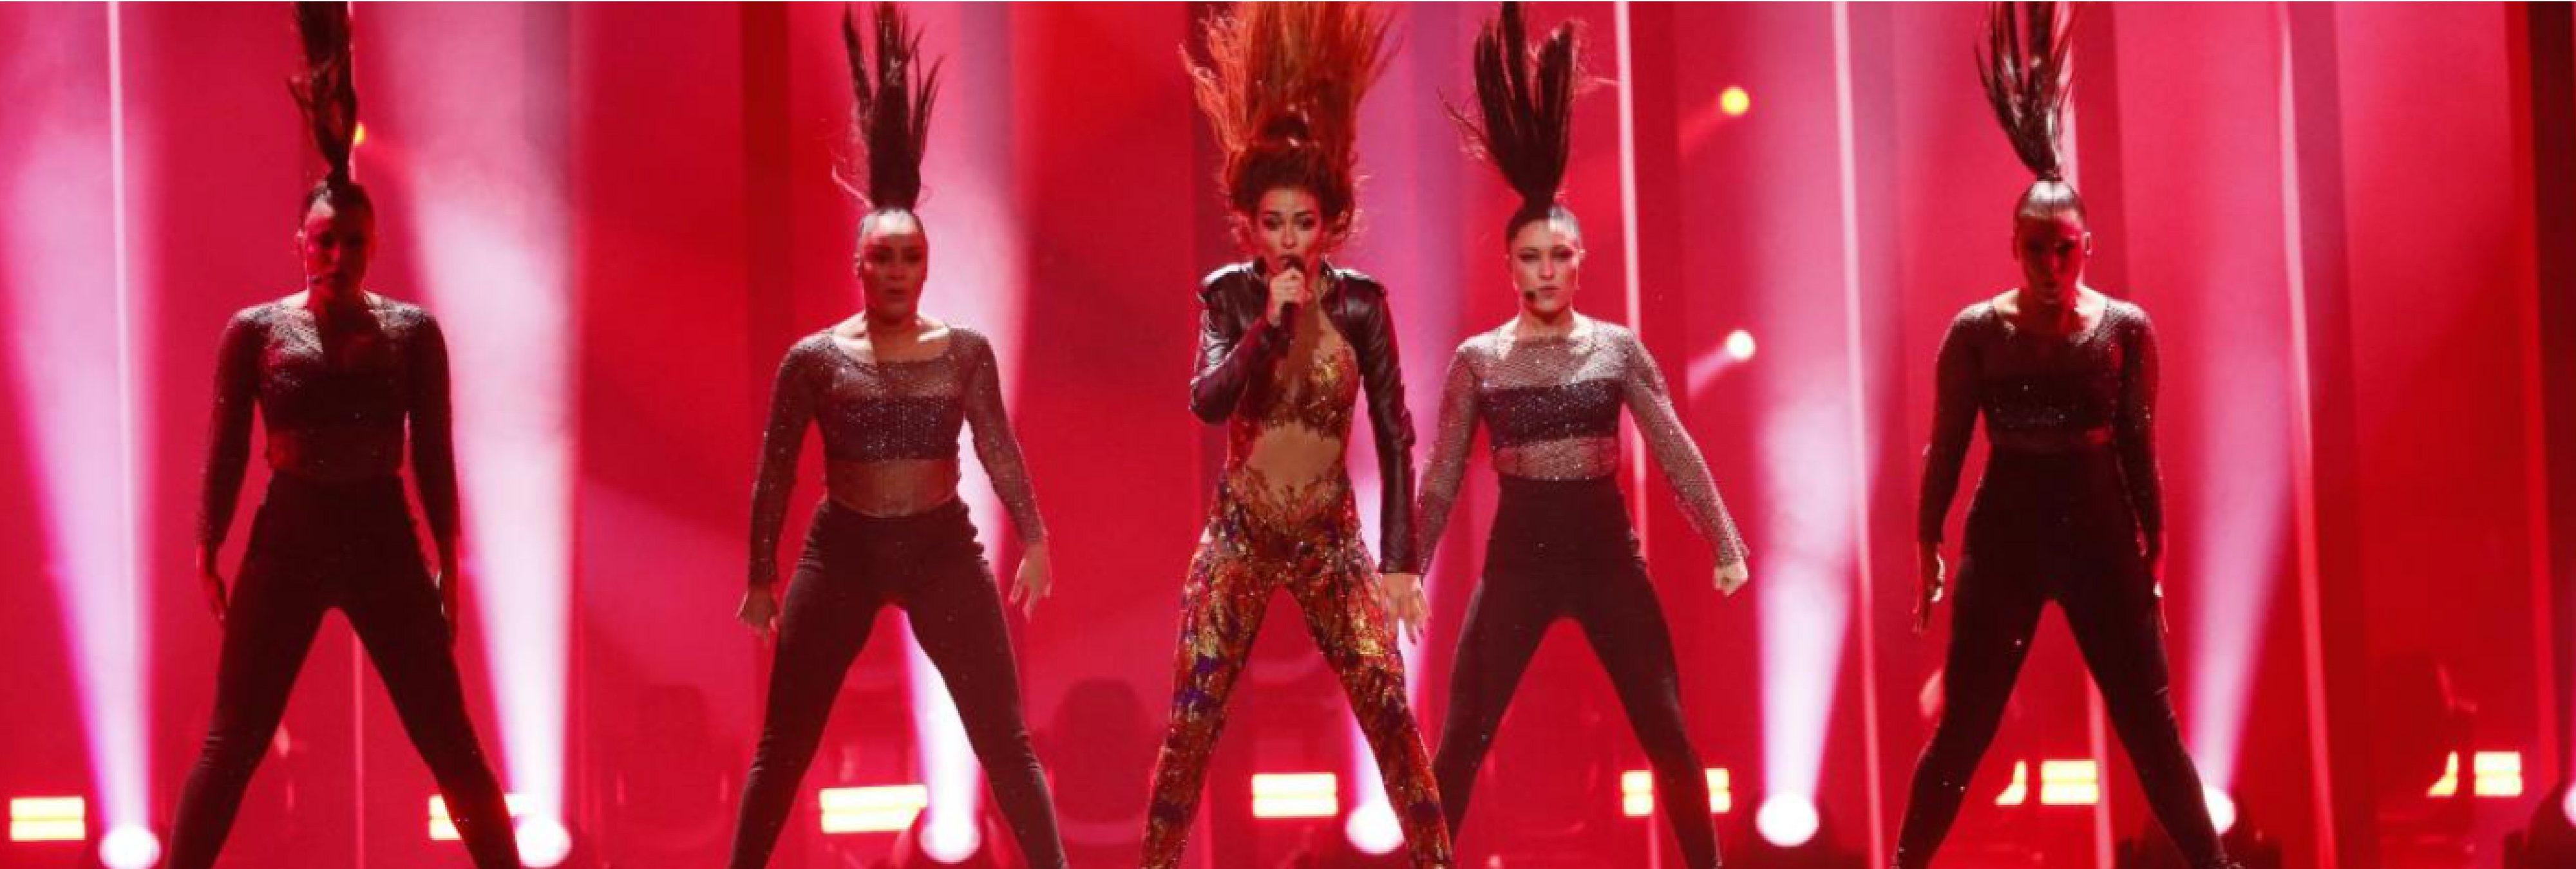 5 datos históricos salidos de la primera semifinal de Eurovisión 2018